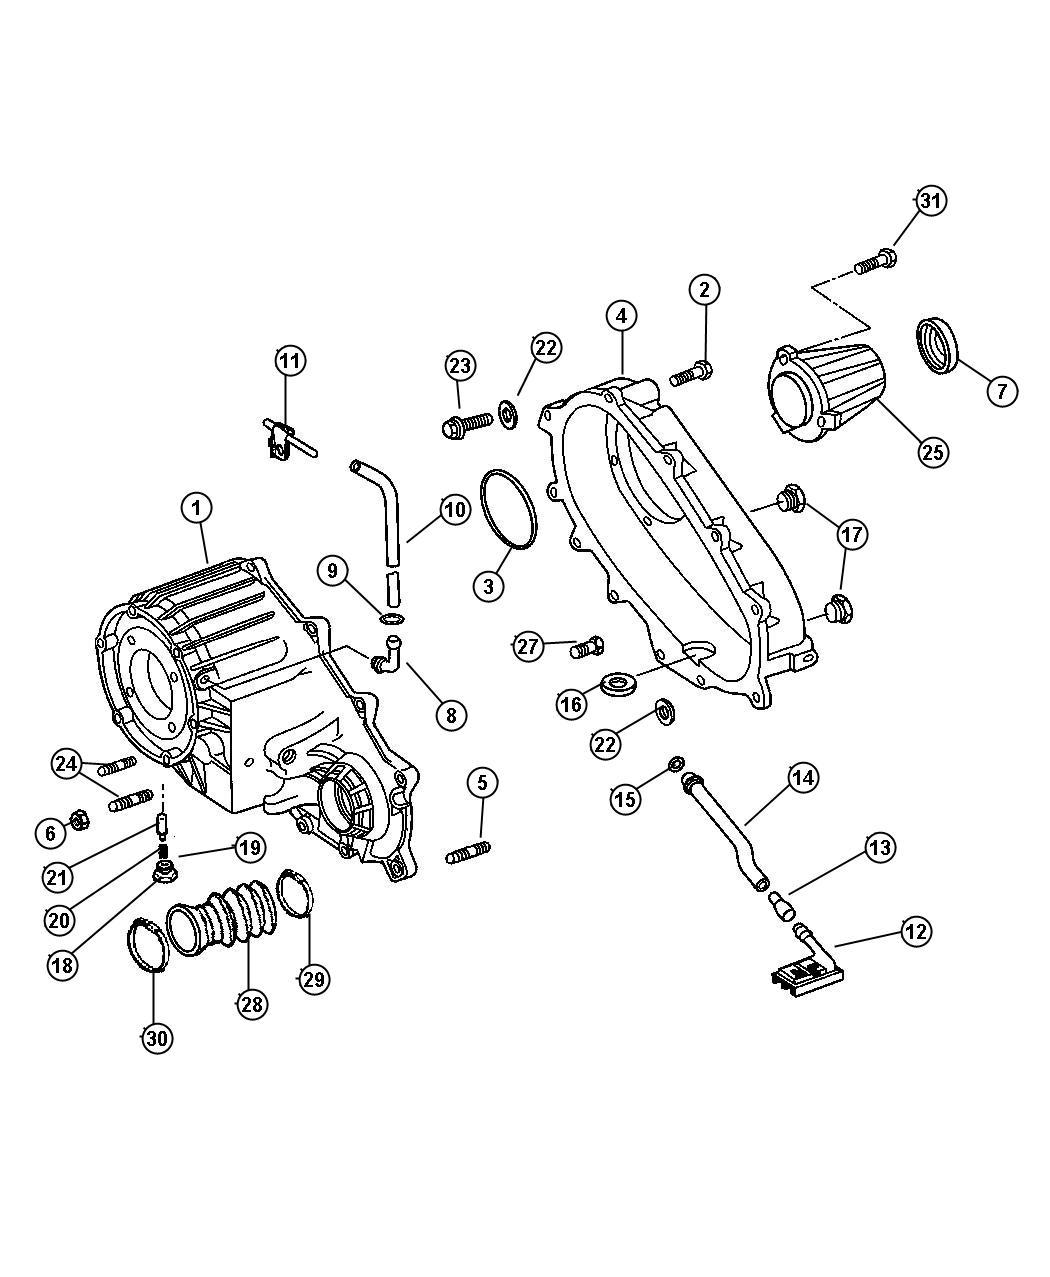 Dodge Truck Manual Transmission Download Free